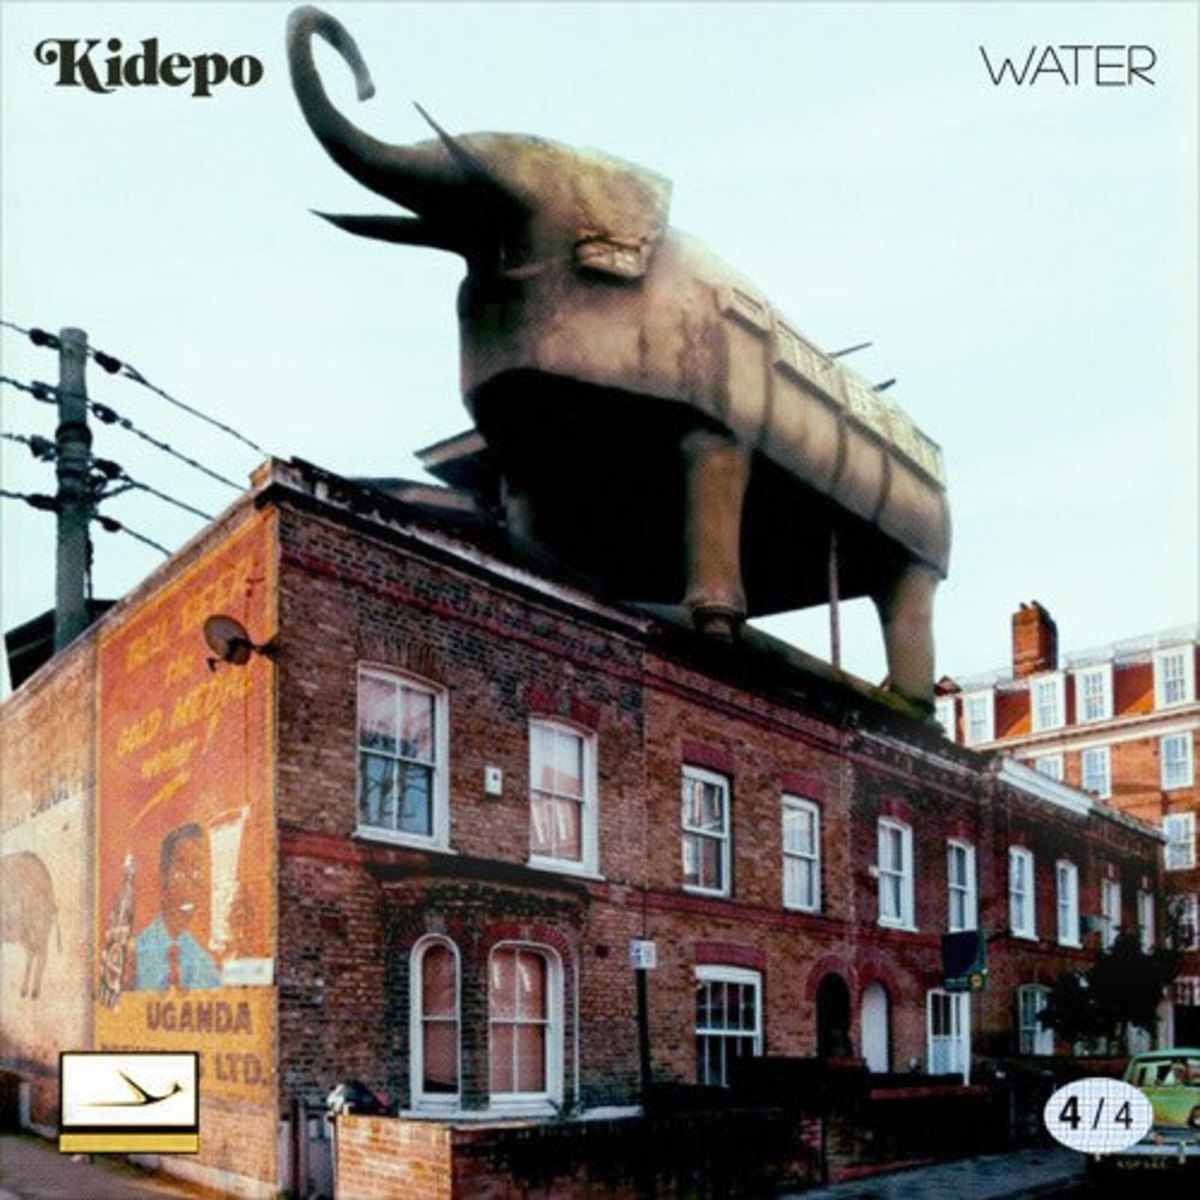 kidepo-water.jpg